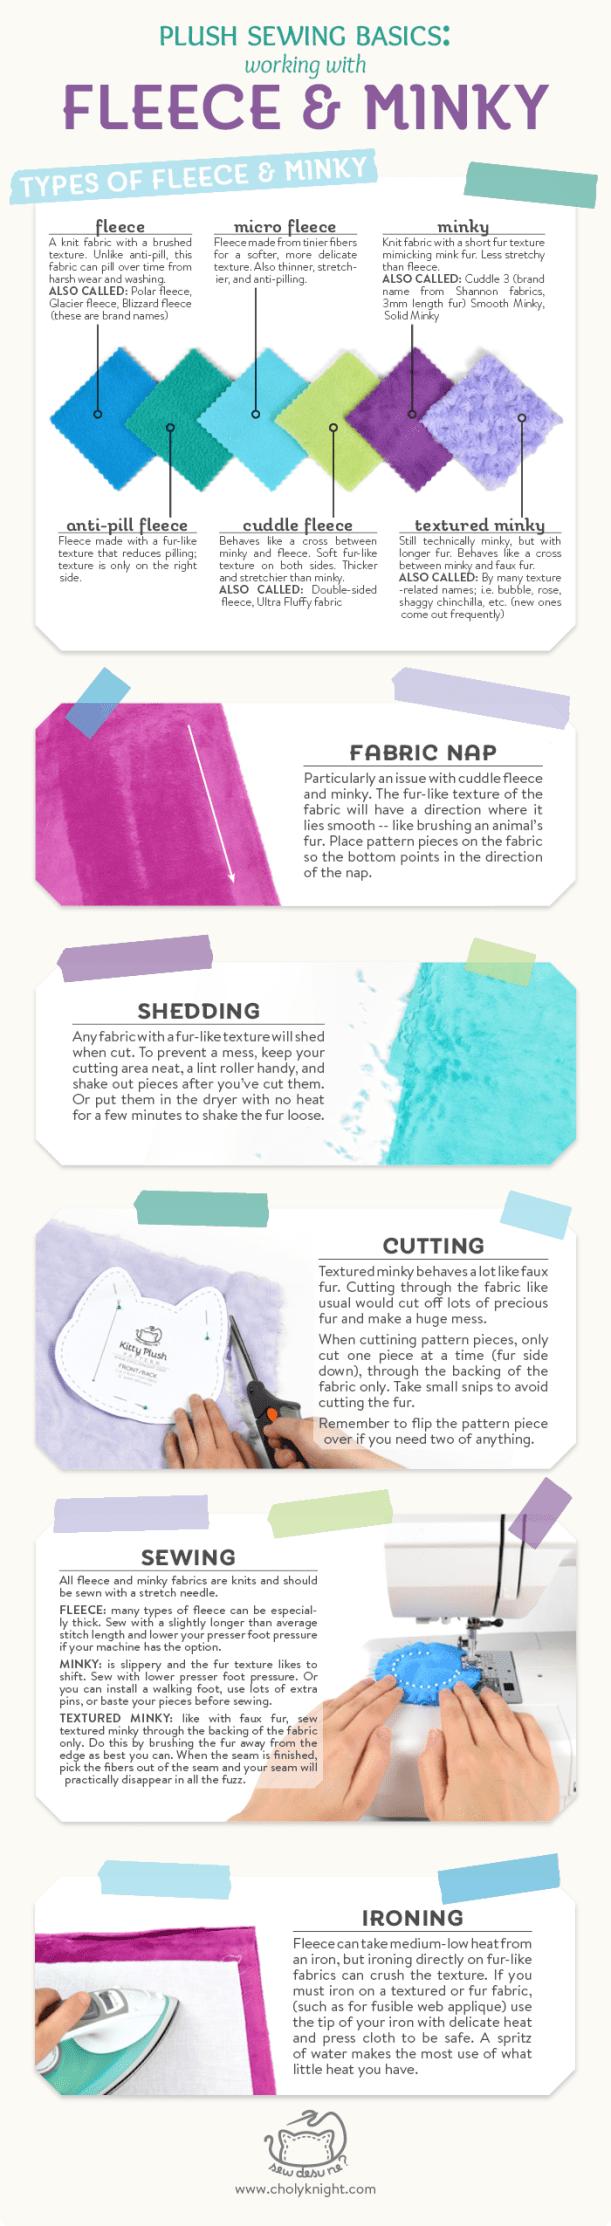 Working with Fleece & Minky Infographic